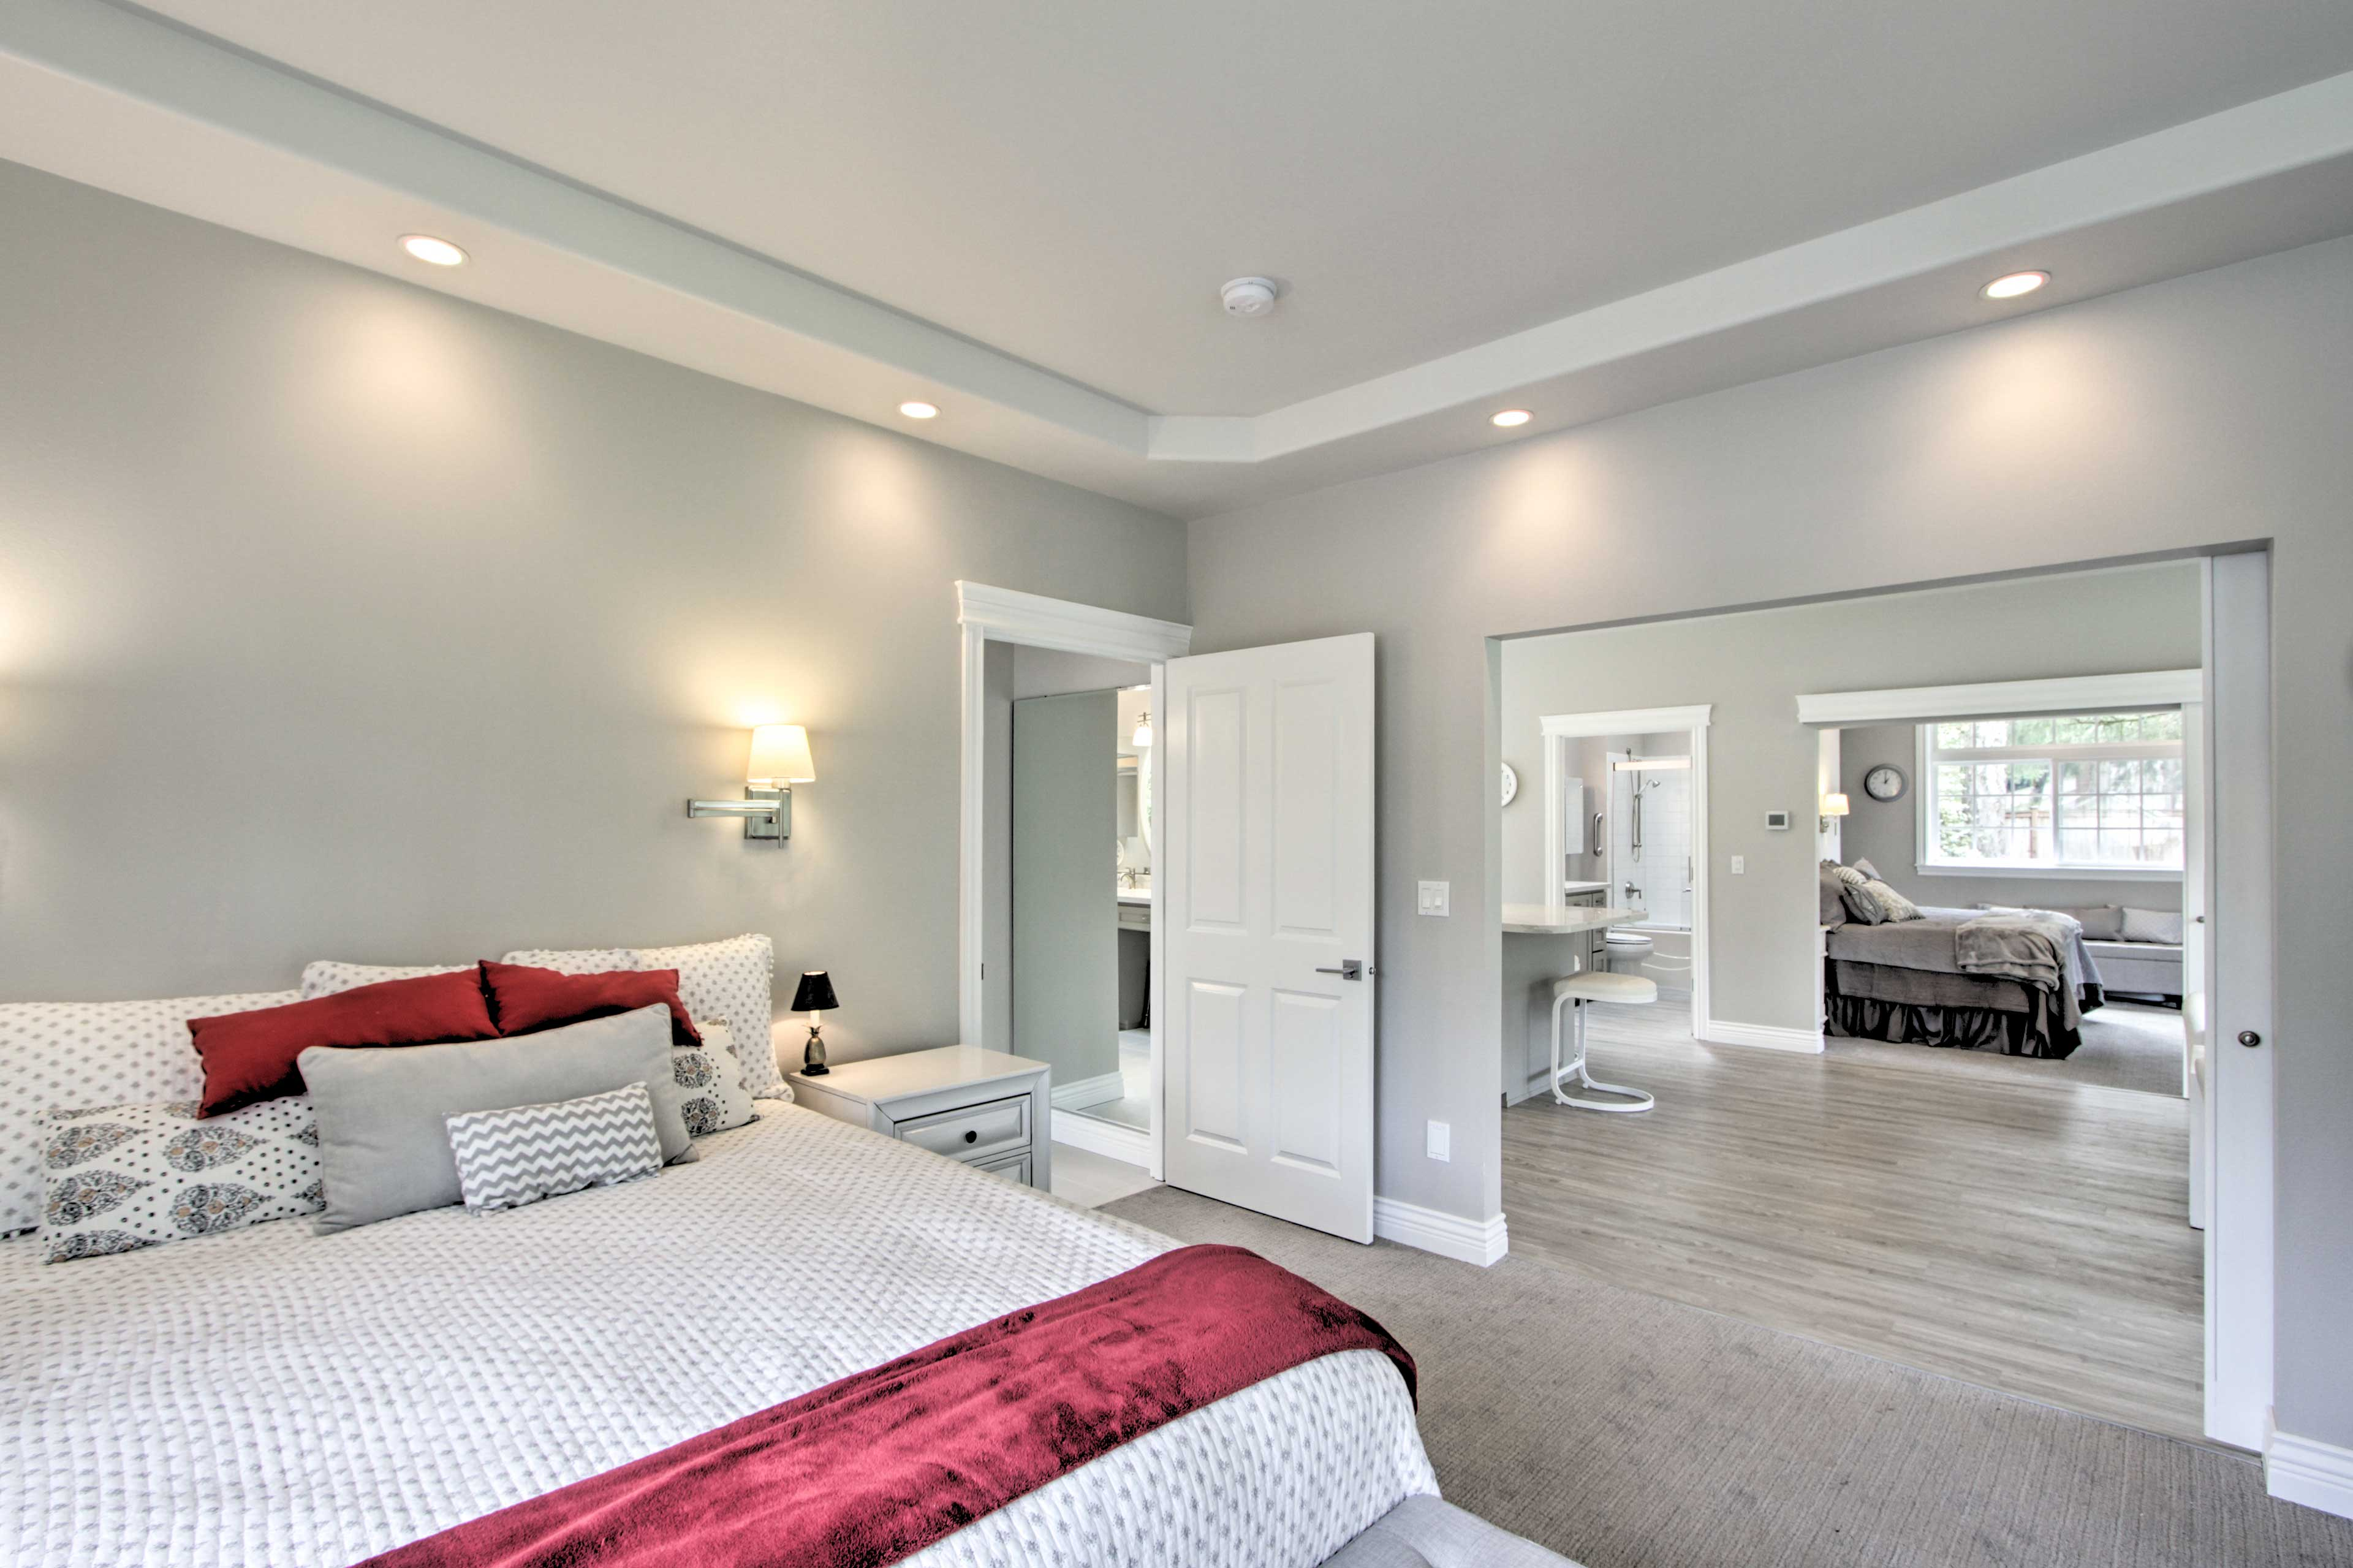 Each bedroom has an en-suite bathroom.